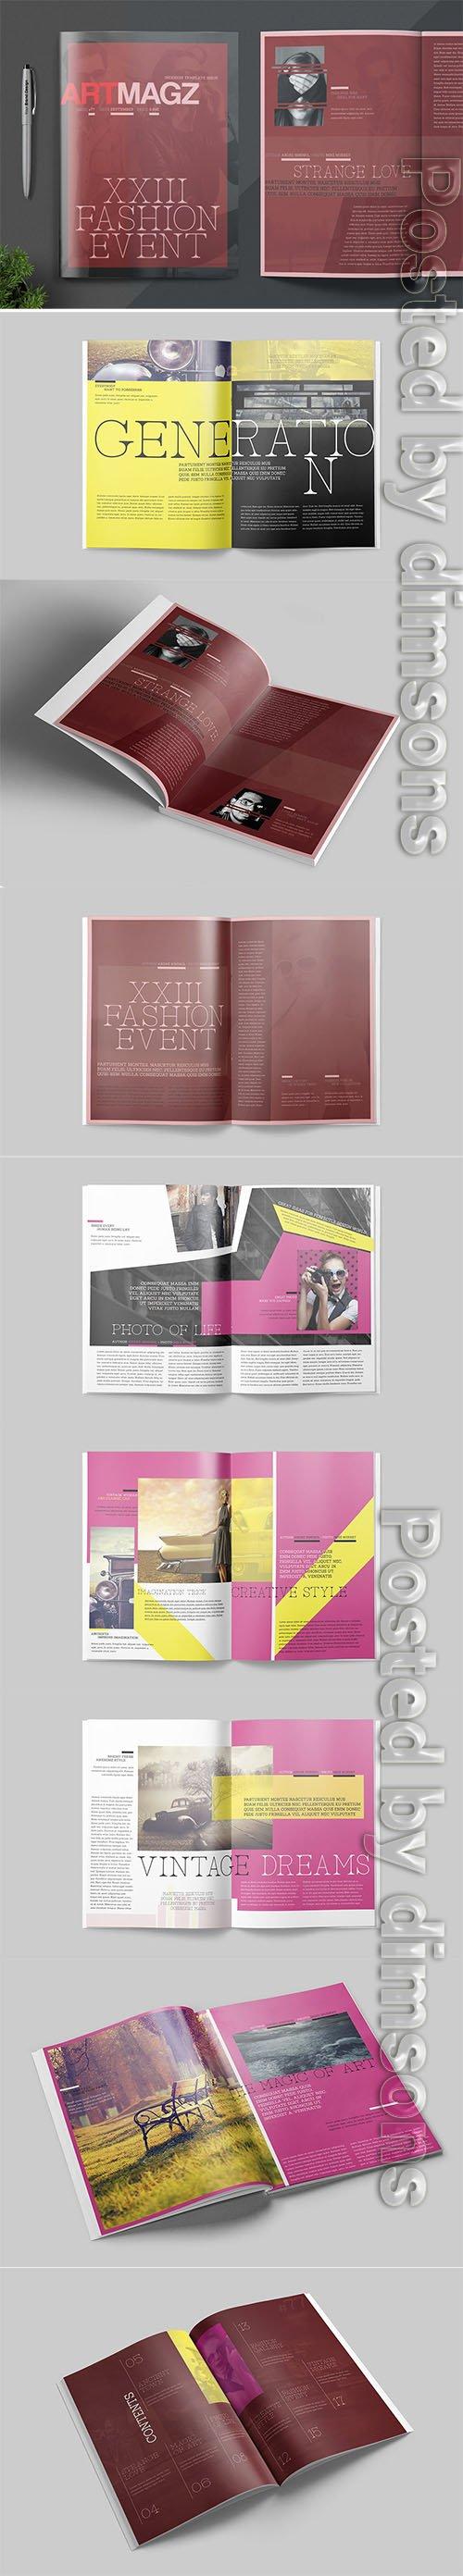 Magazine Template - Artmag